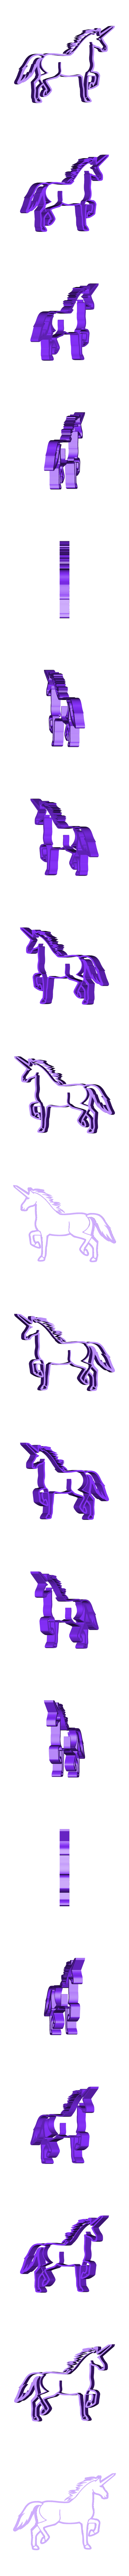 unicorn7.stl Download STL file  8 X UNICORN COOKIE CUTTER • Object to 3D print, mariospeed